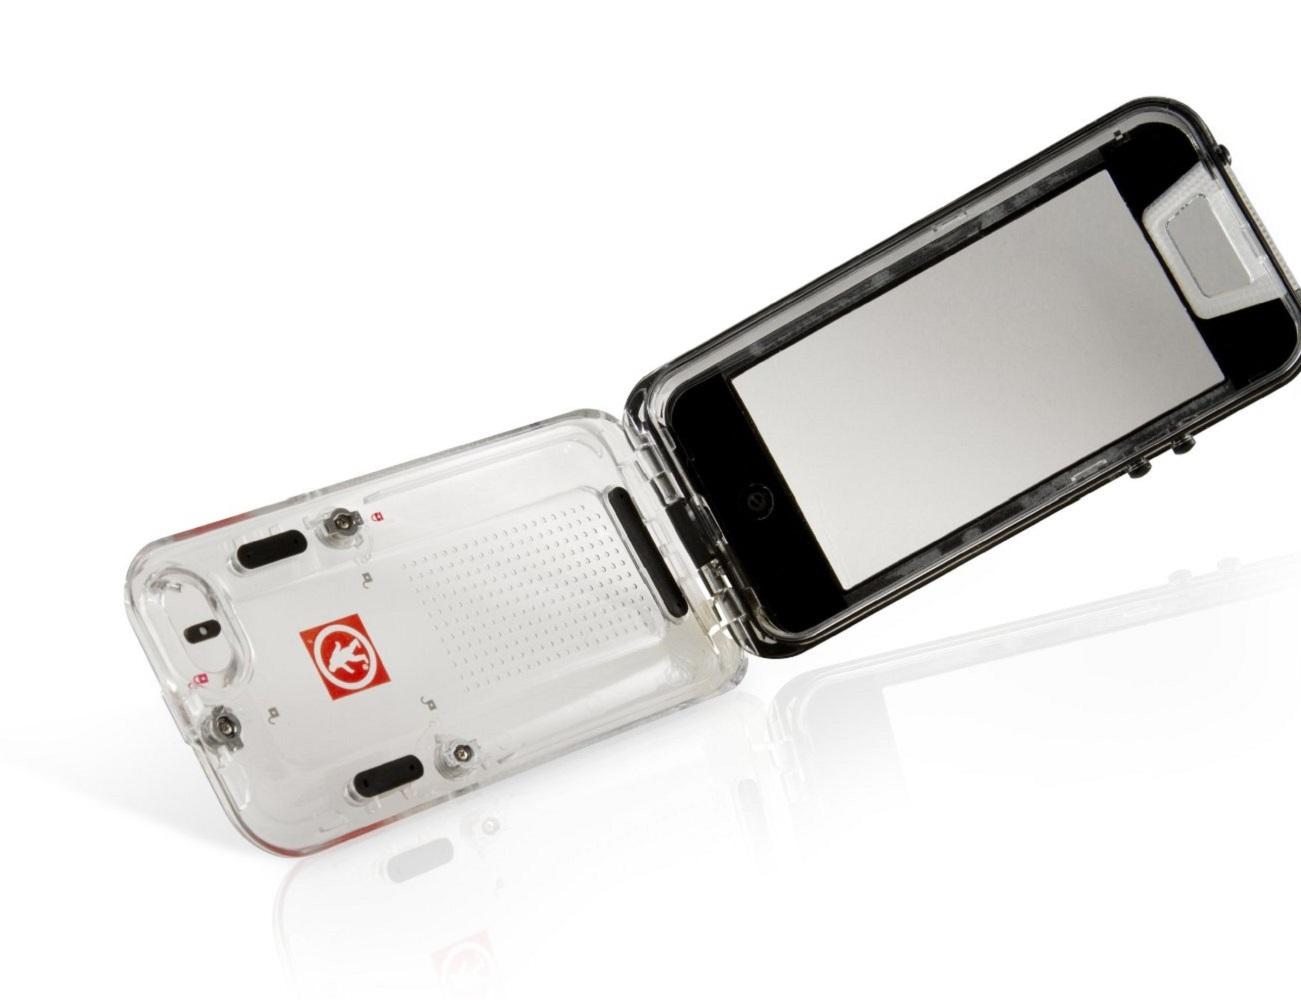 Safe5 Waterproof iPhone SE/5s Case